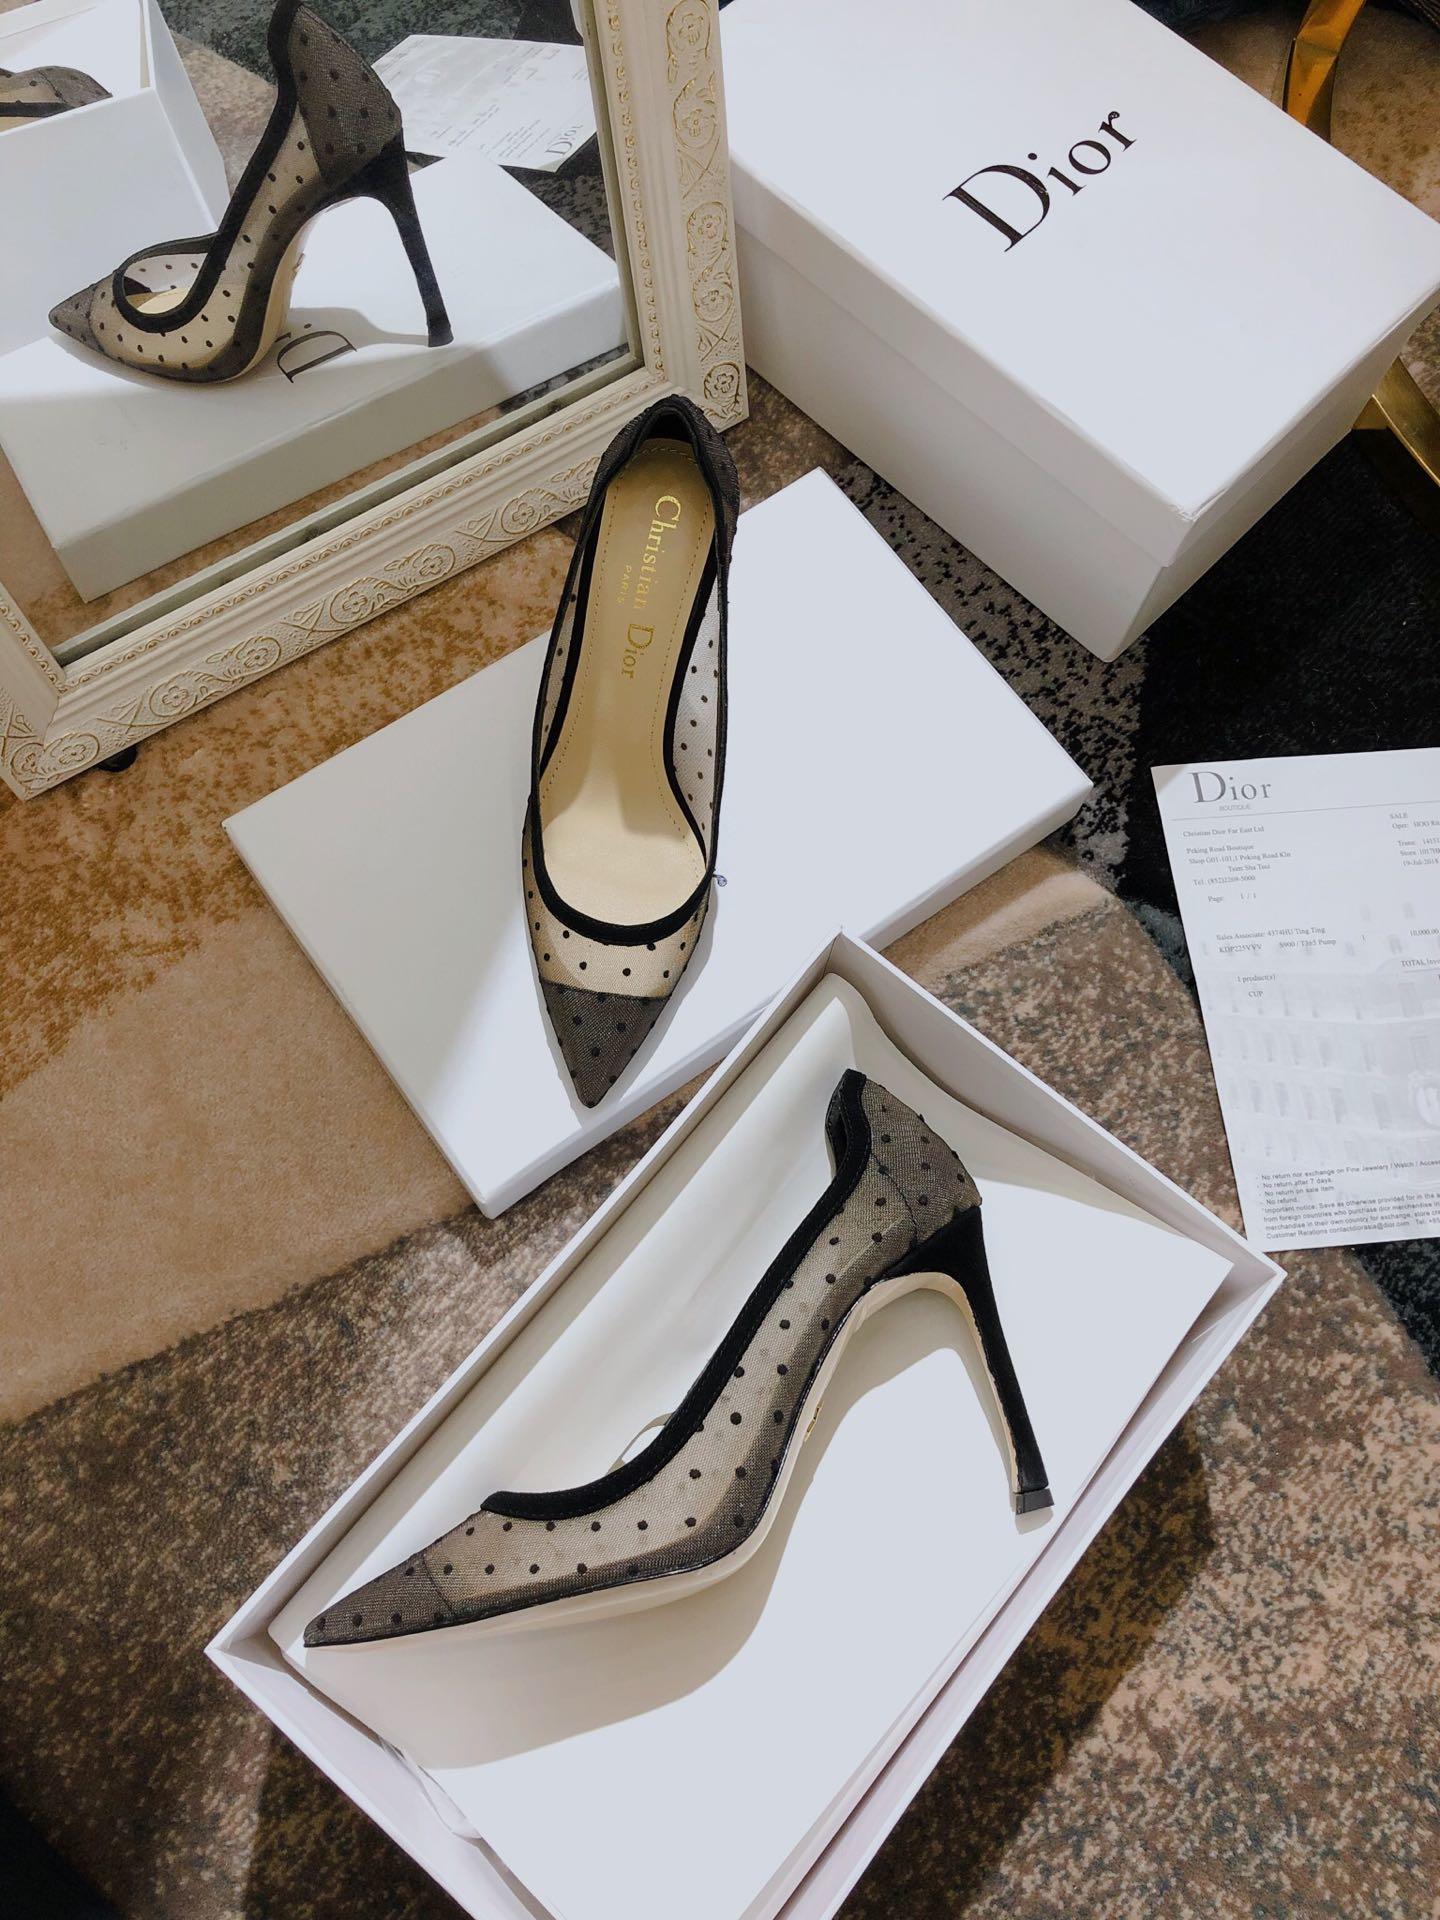 J'ADIOR 迪奥高跟鞋 Dior 19SS早春新款D-MOI优雅高跟尖头女单鞋